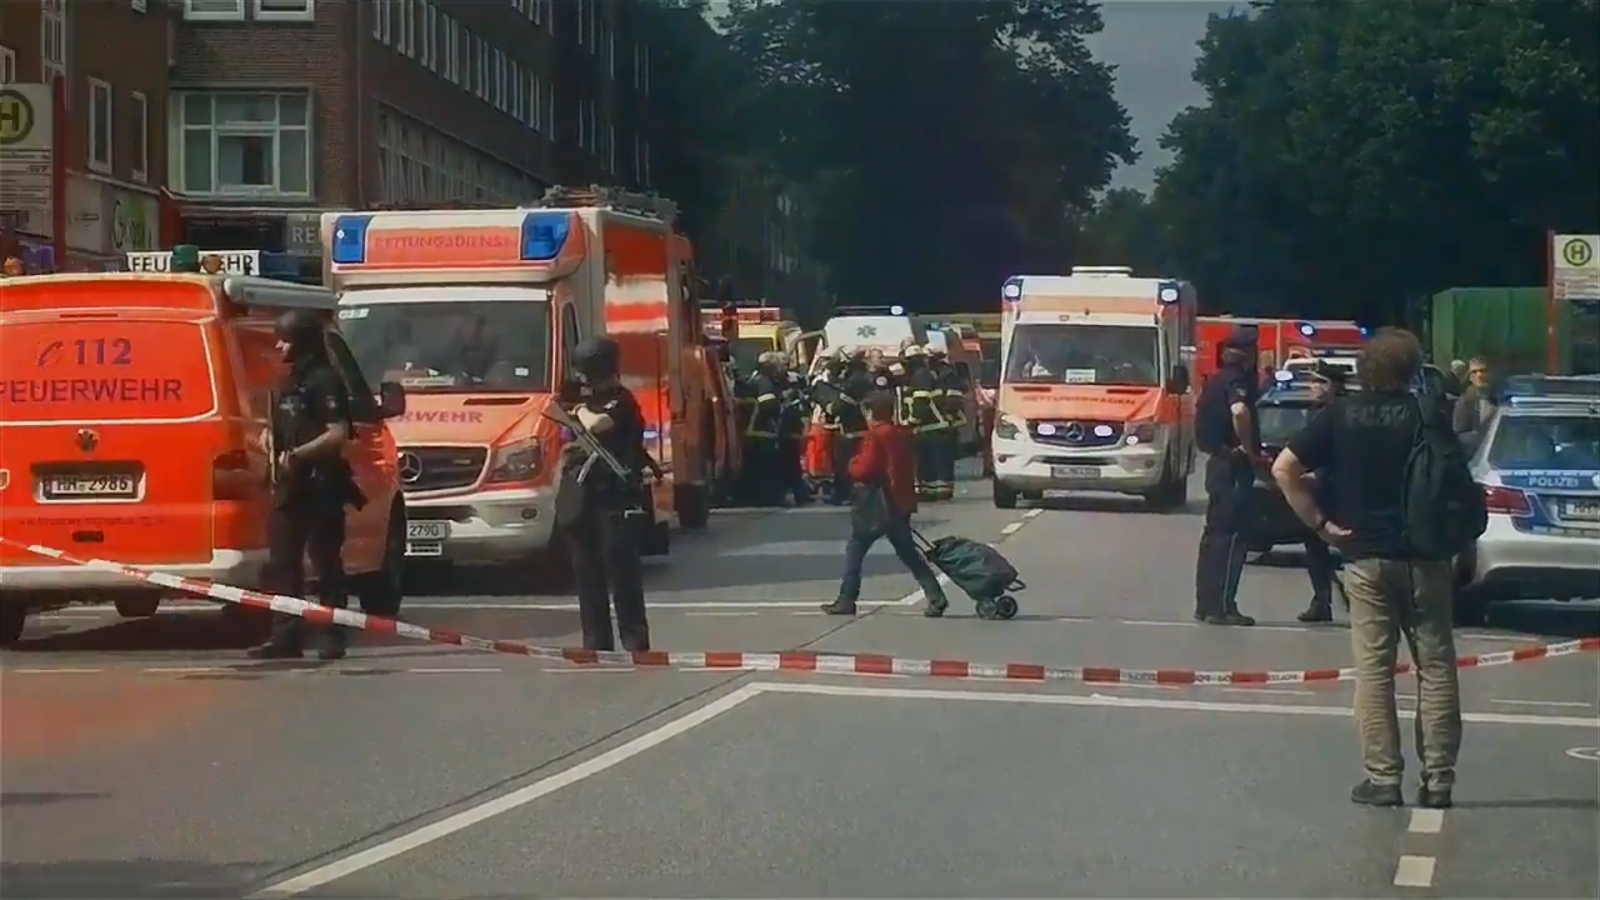 one-killed-and-several-injured-following-mass-stabbing-at-supermarket-in-hamburg